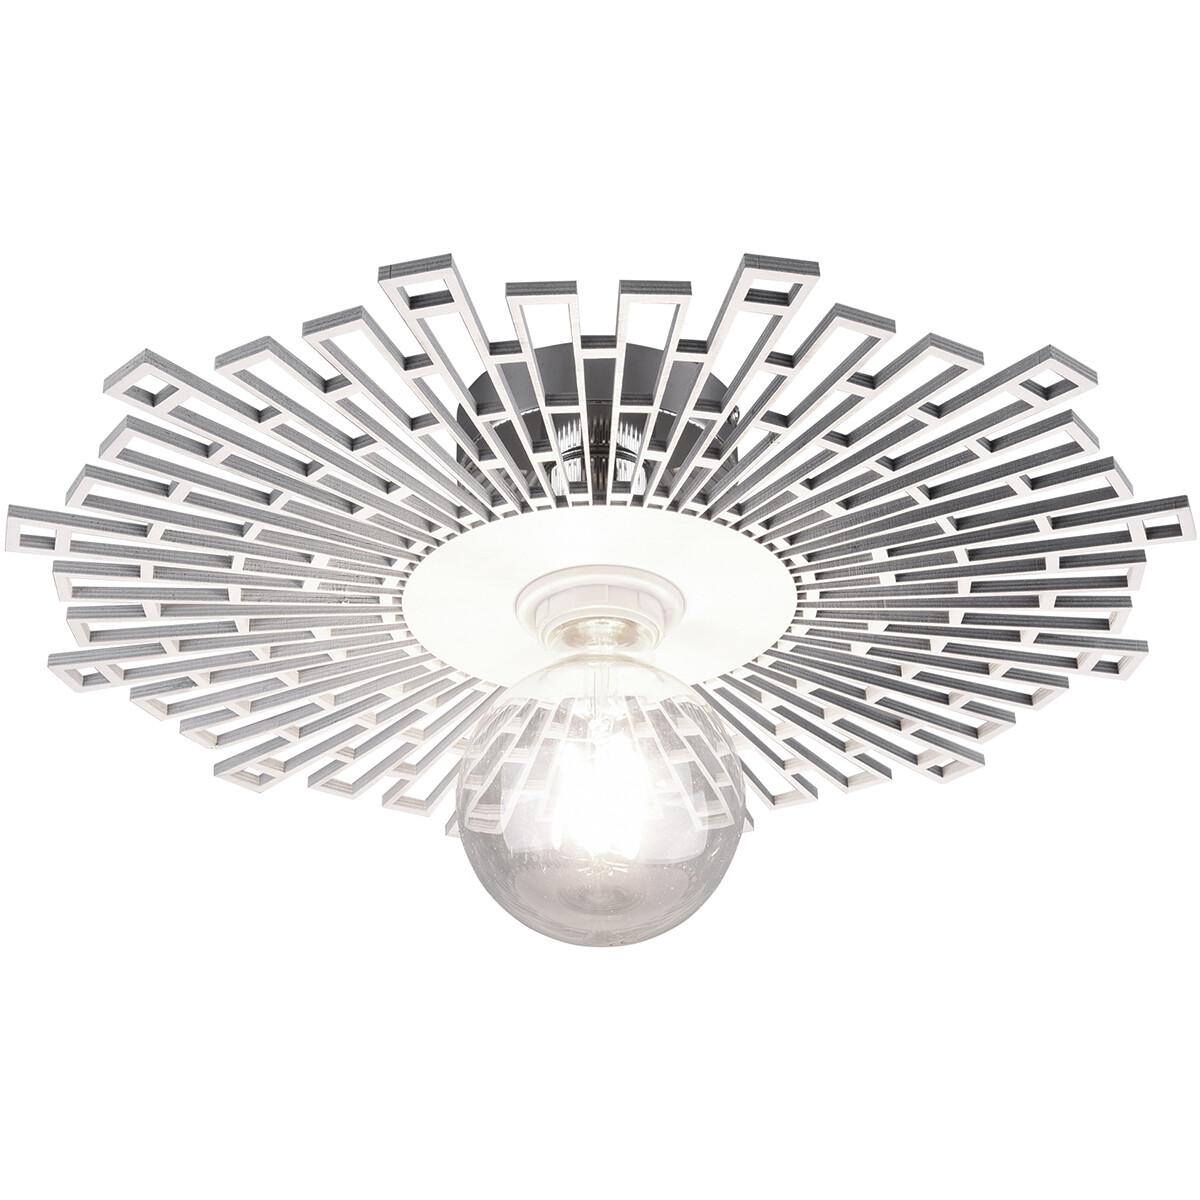 LED Plafondlamp - Plafondverlichting - Trion Mila - E27 Fitting - Rond - Mat Wit - Aluminium